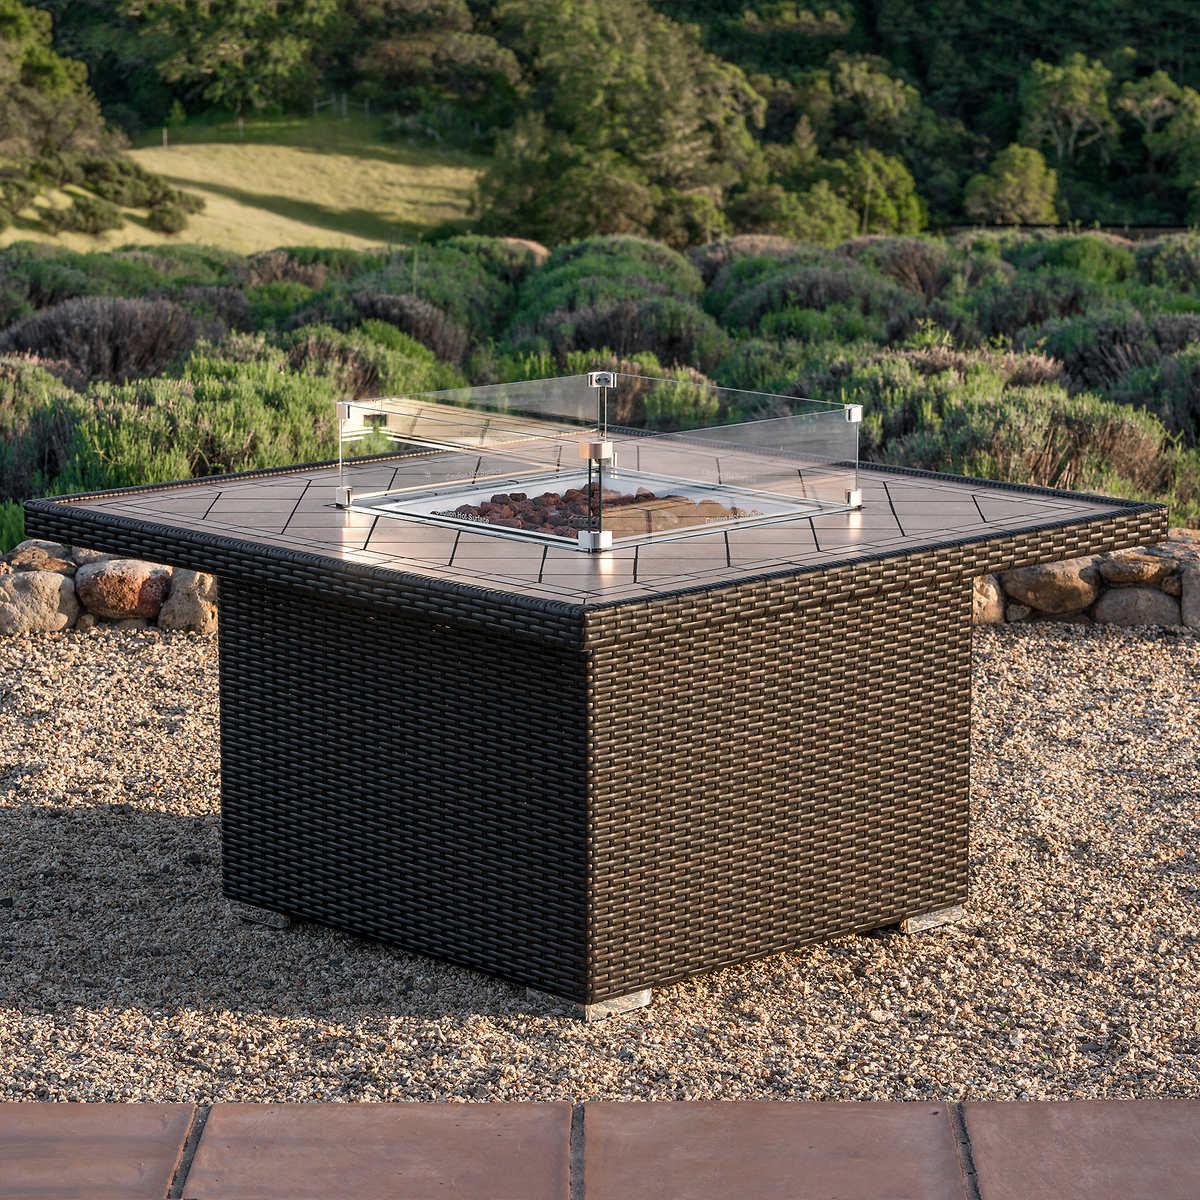 SirioTM Niko Brown Propane Fire Pit Table